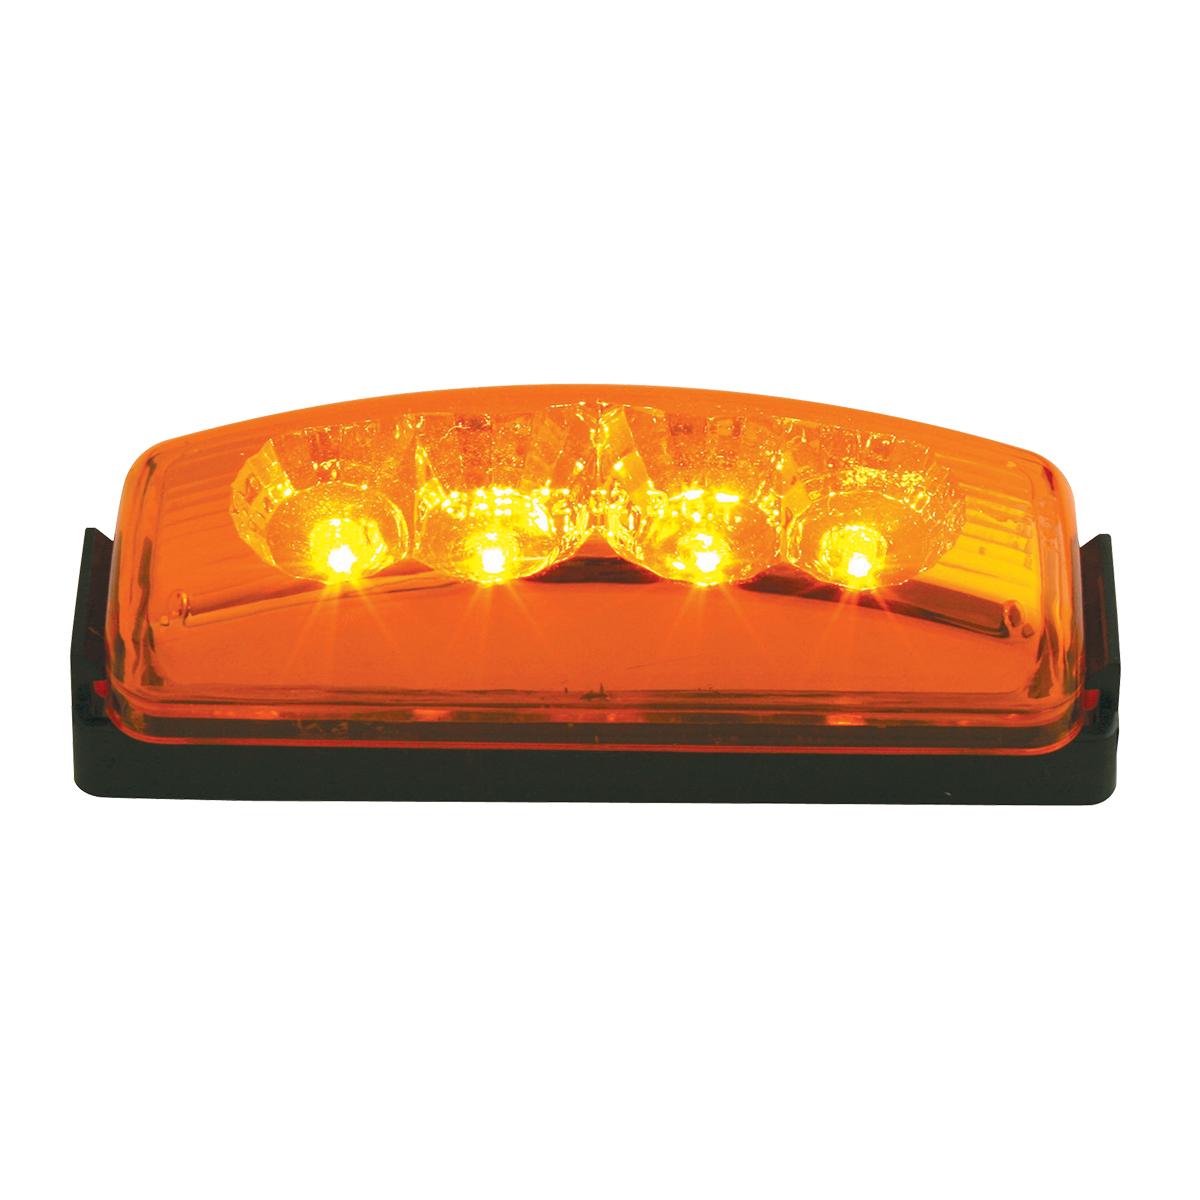 77850 Medium Rectangular Spyder LED Marker Light